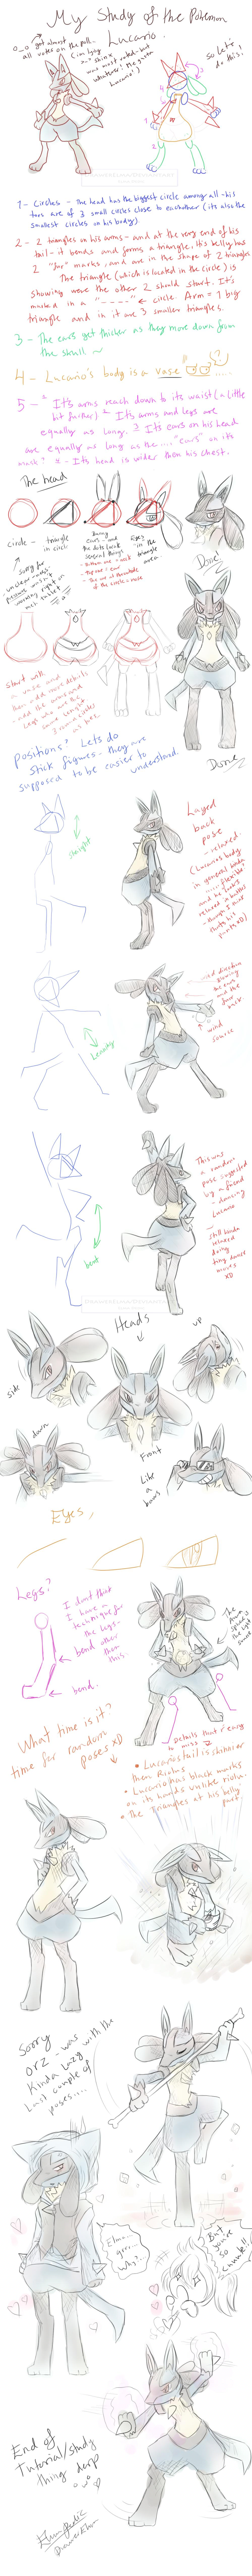 How to Draw Lucario- DrawerElma's Study by DrawerElma